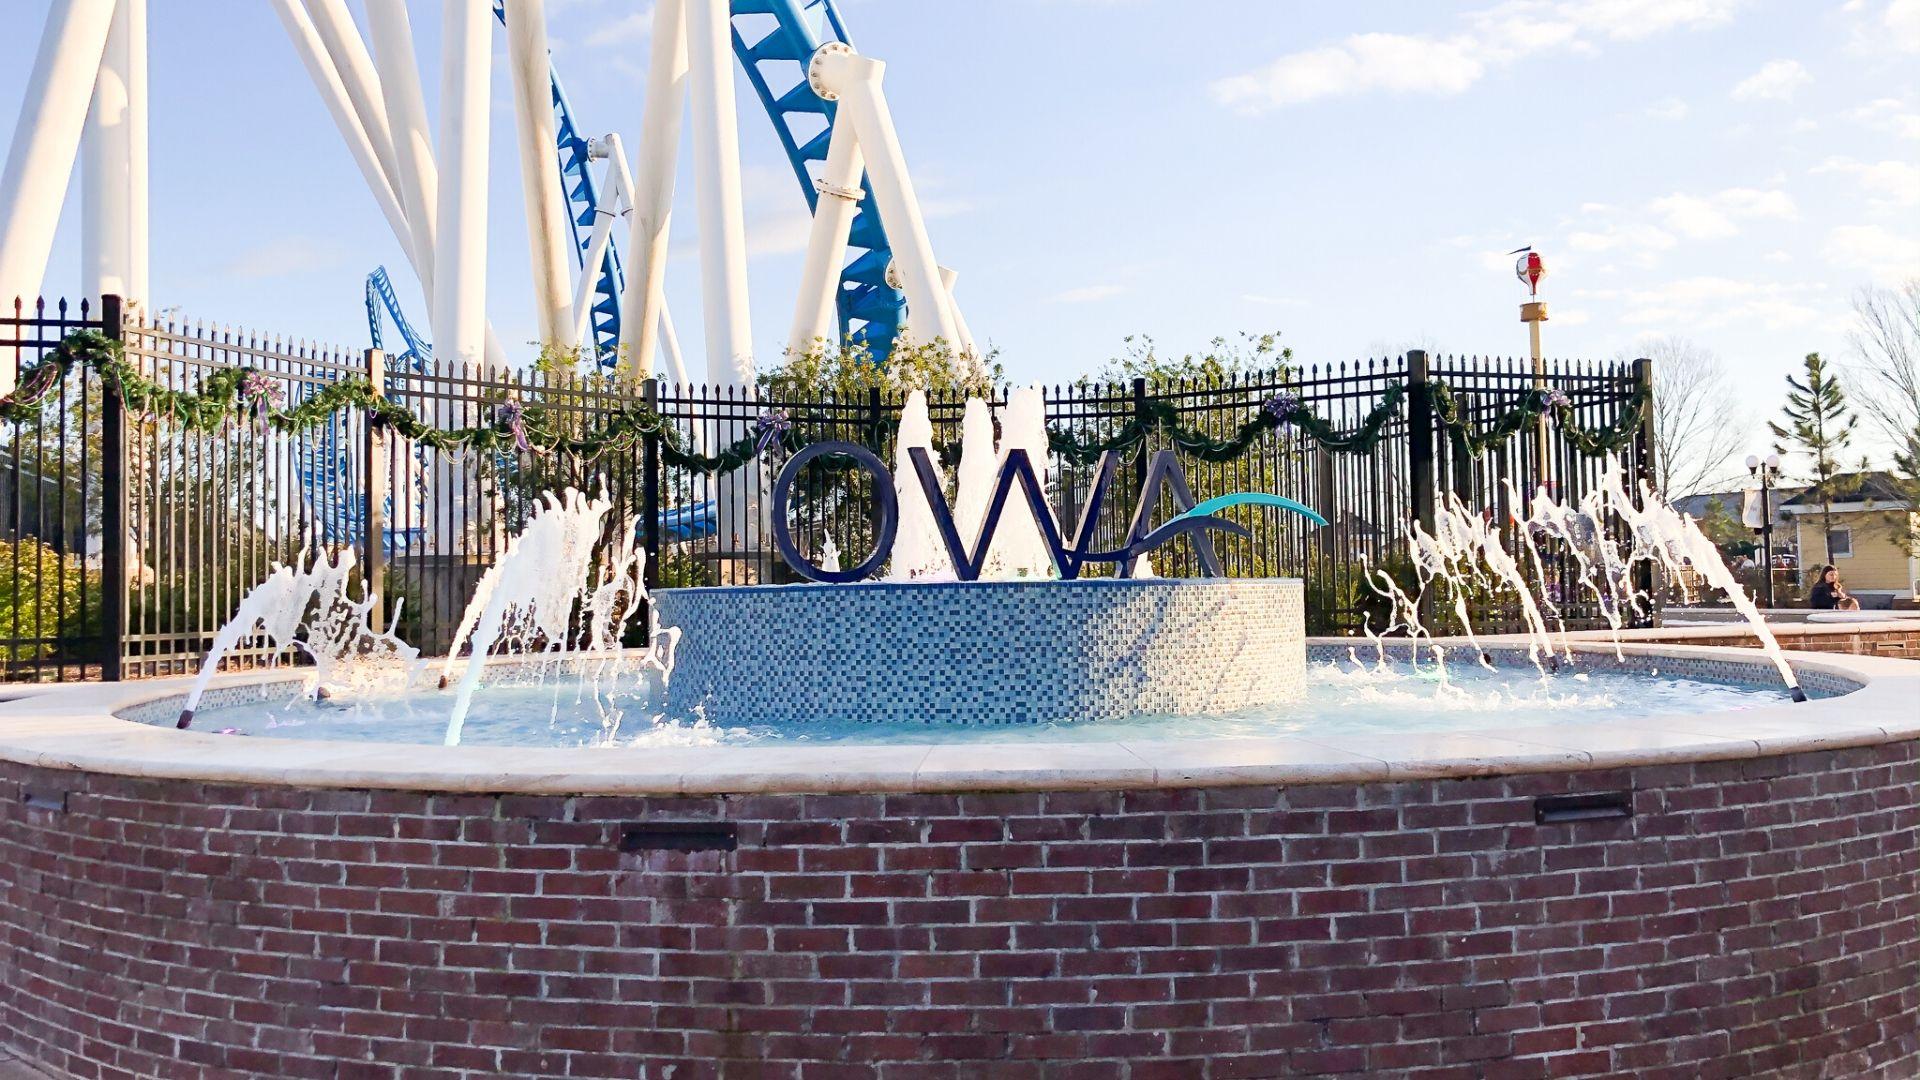 OWA fountain